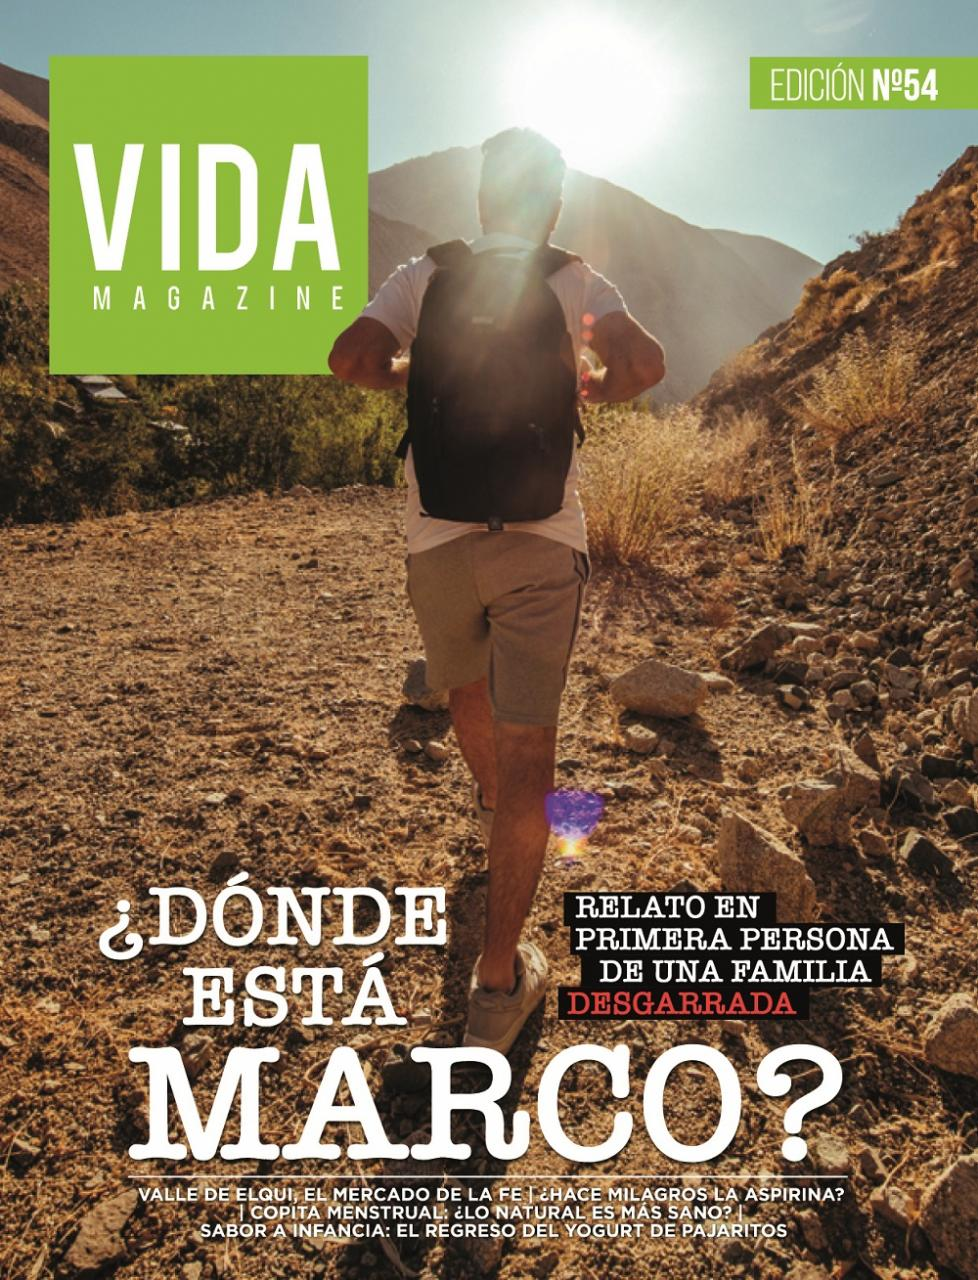 vida-magazine-edicion-n-54